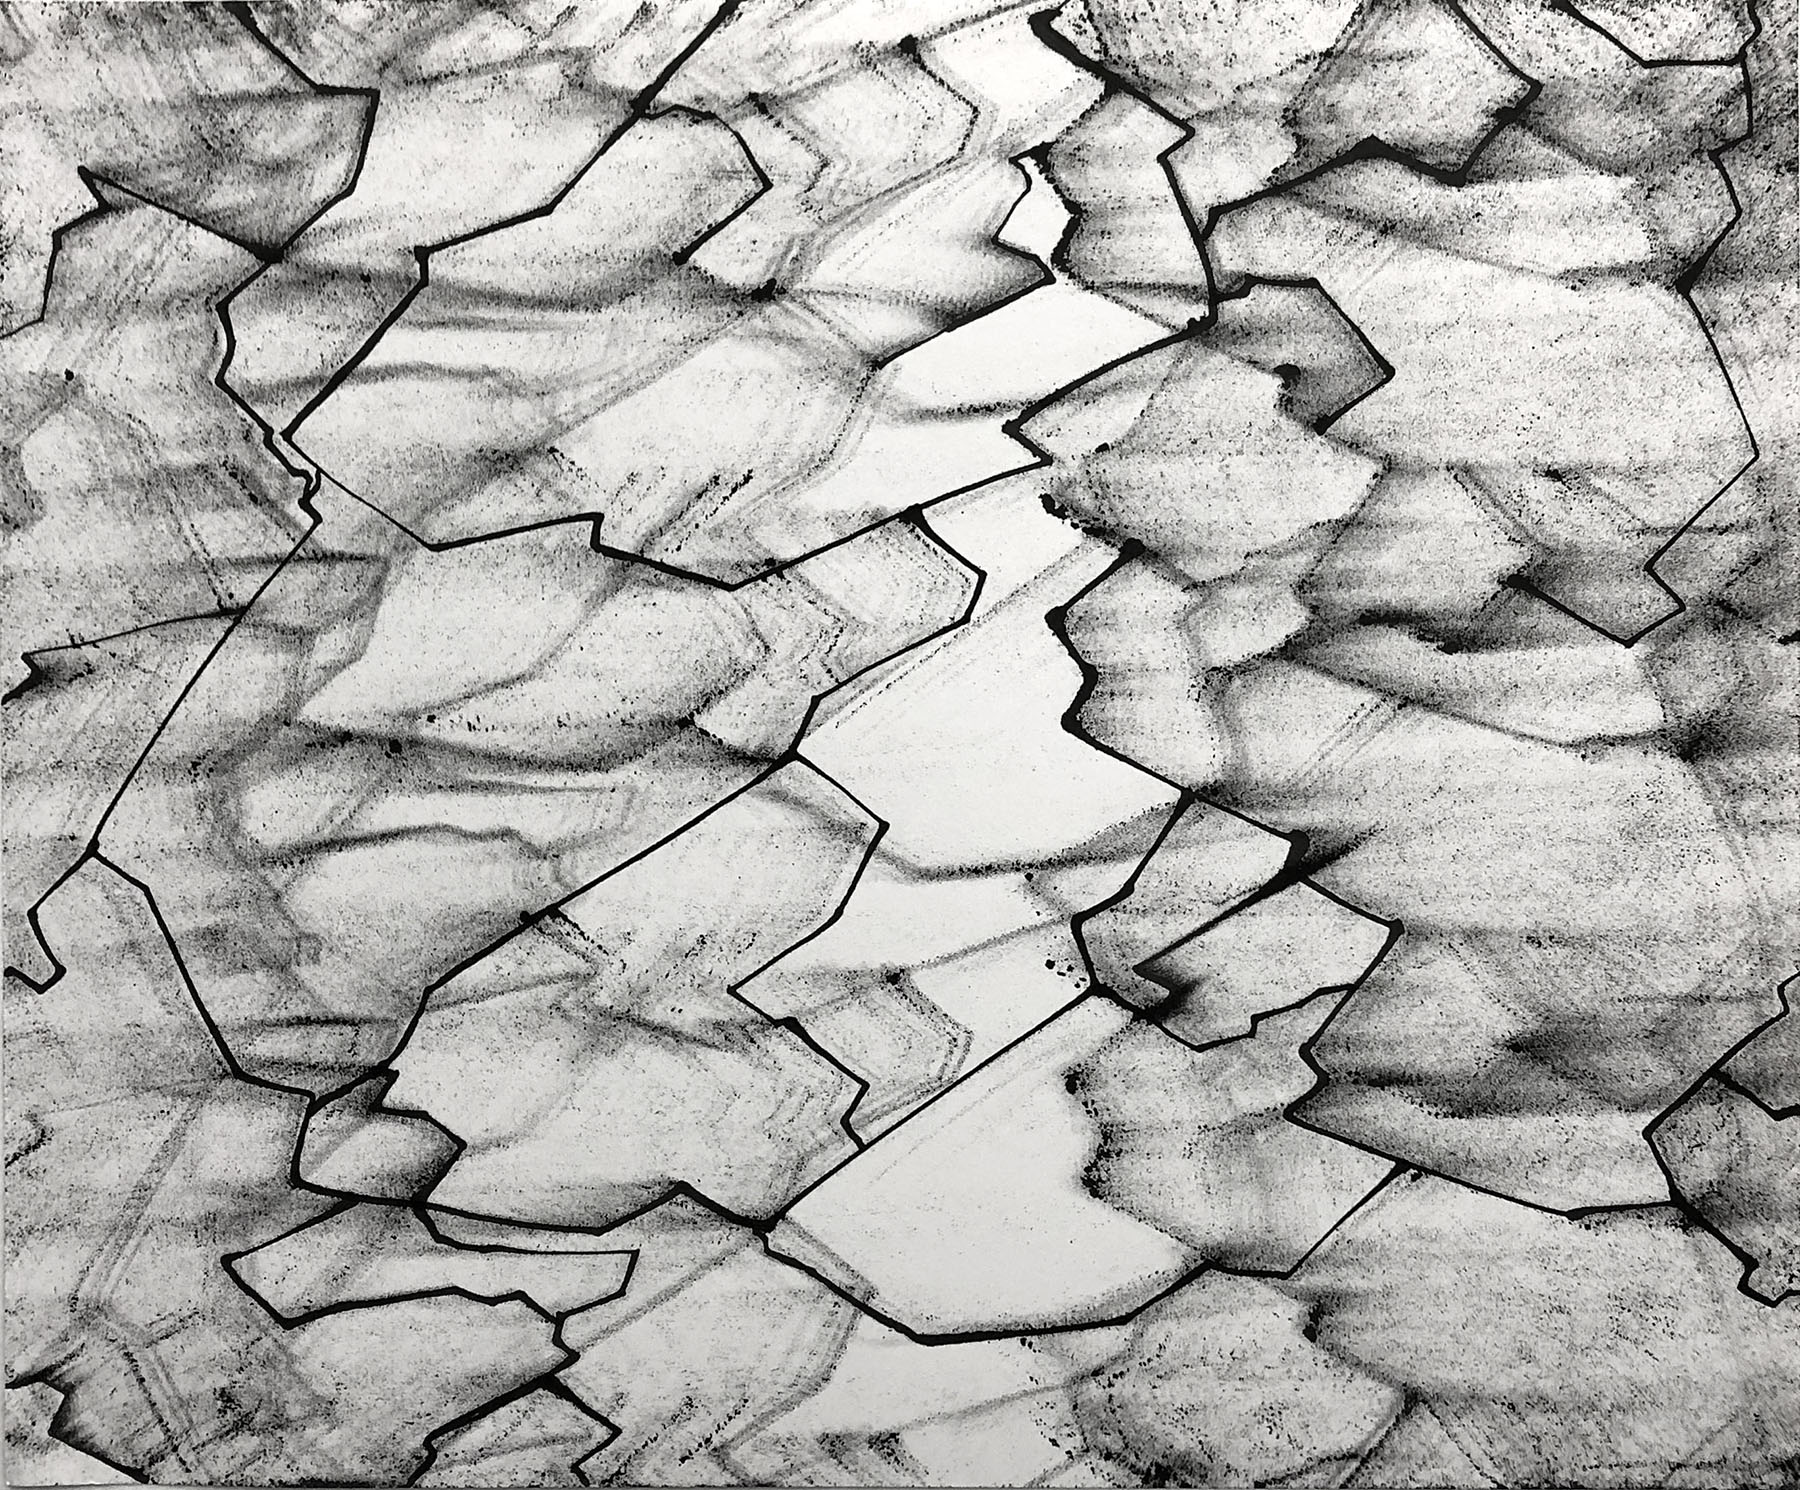 Rine, 14x17, Ink on Paper